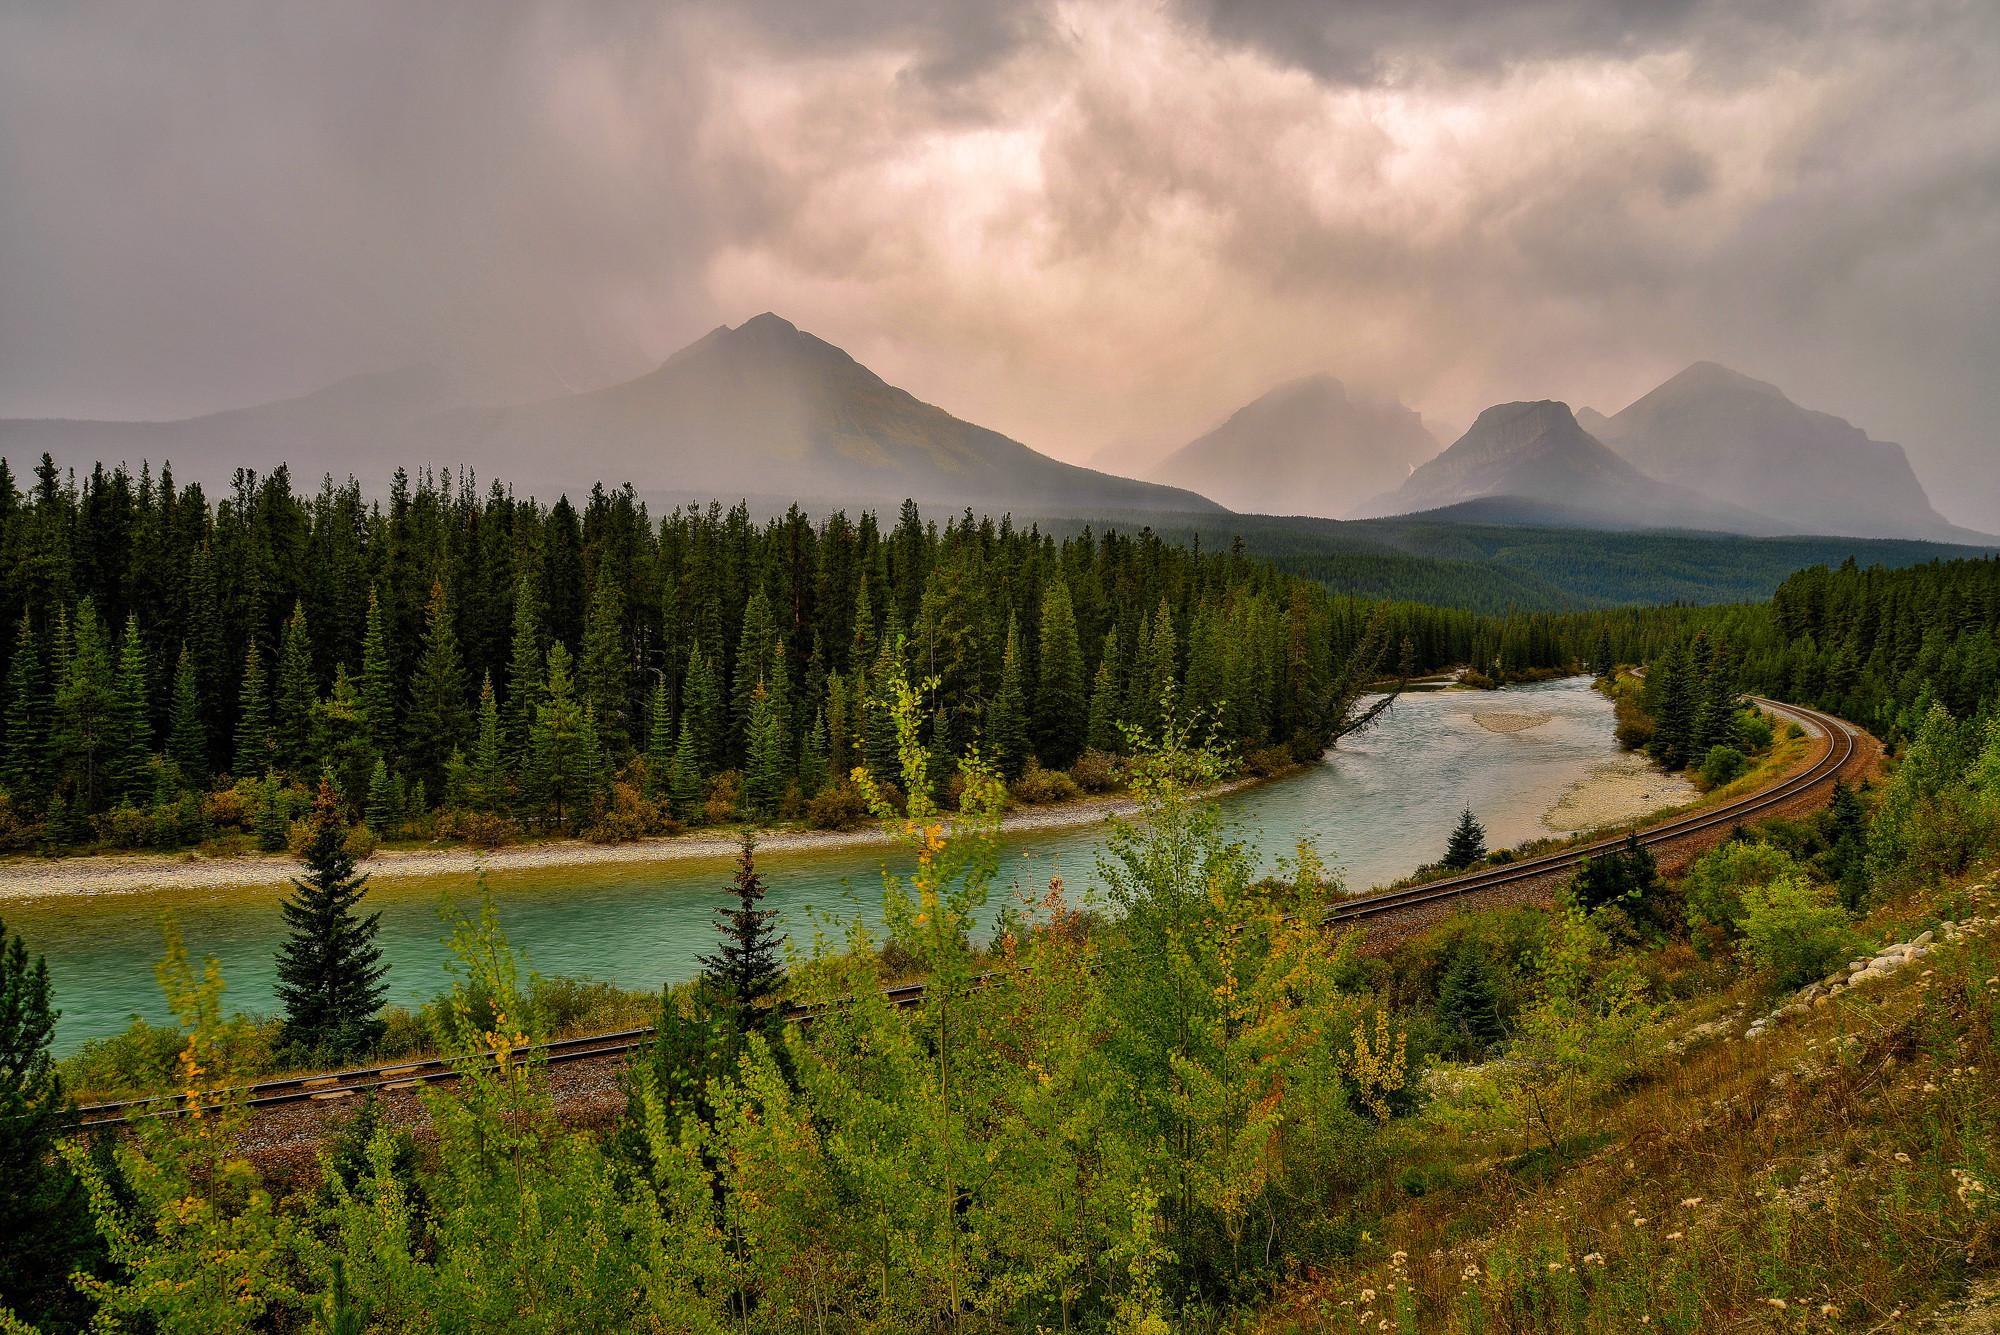 обои Banff national park Canadian Rockies, Alberta, Bow River, Canada картинки фото